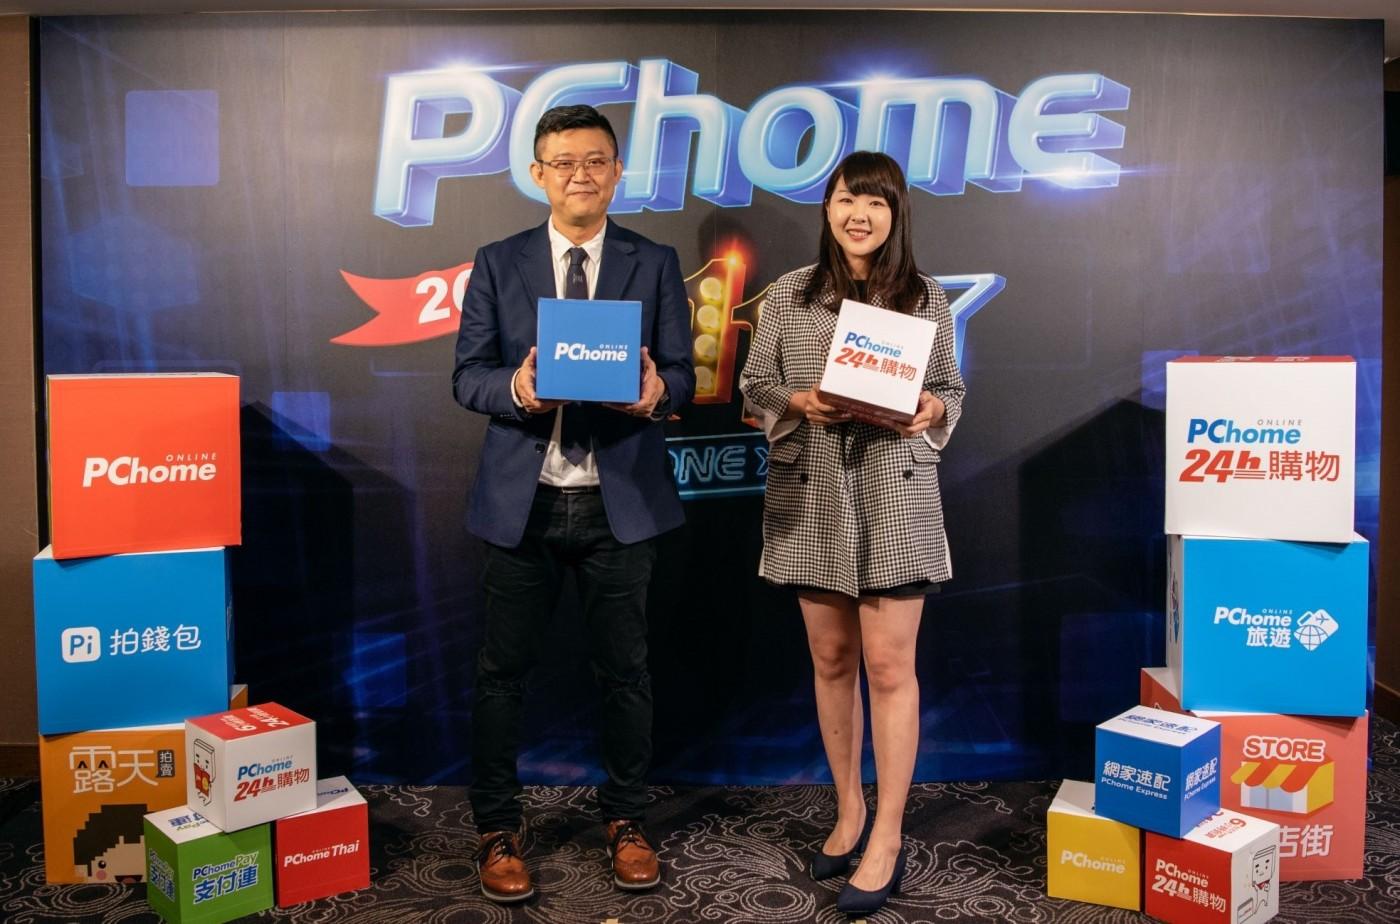 PChome用科技戰打雙11,智慧推薦信用卡、AI預測熱賣品紛出籠